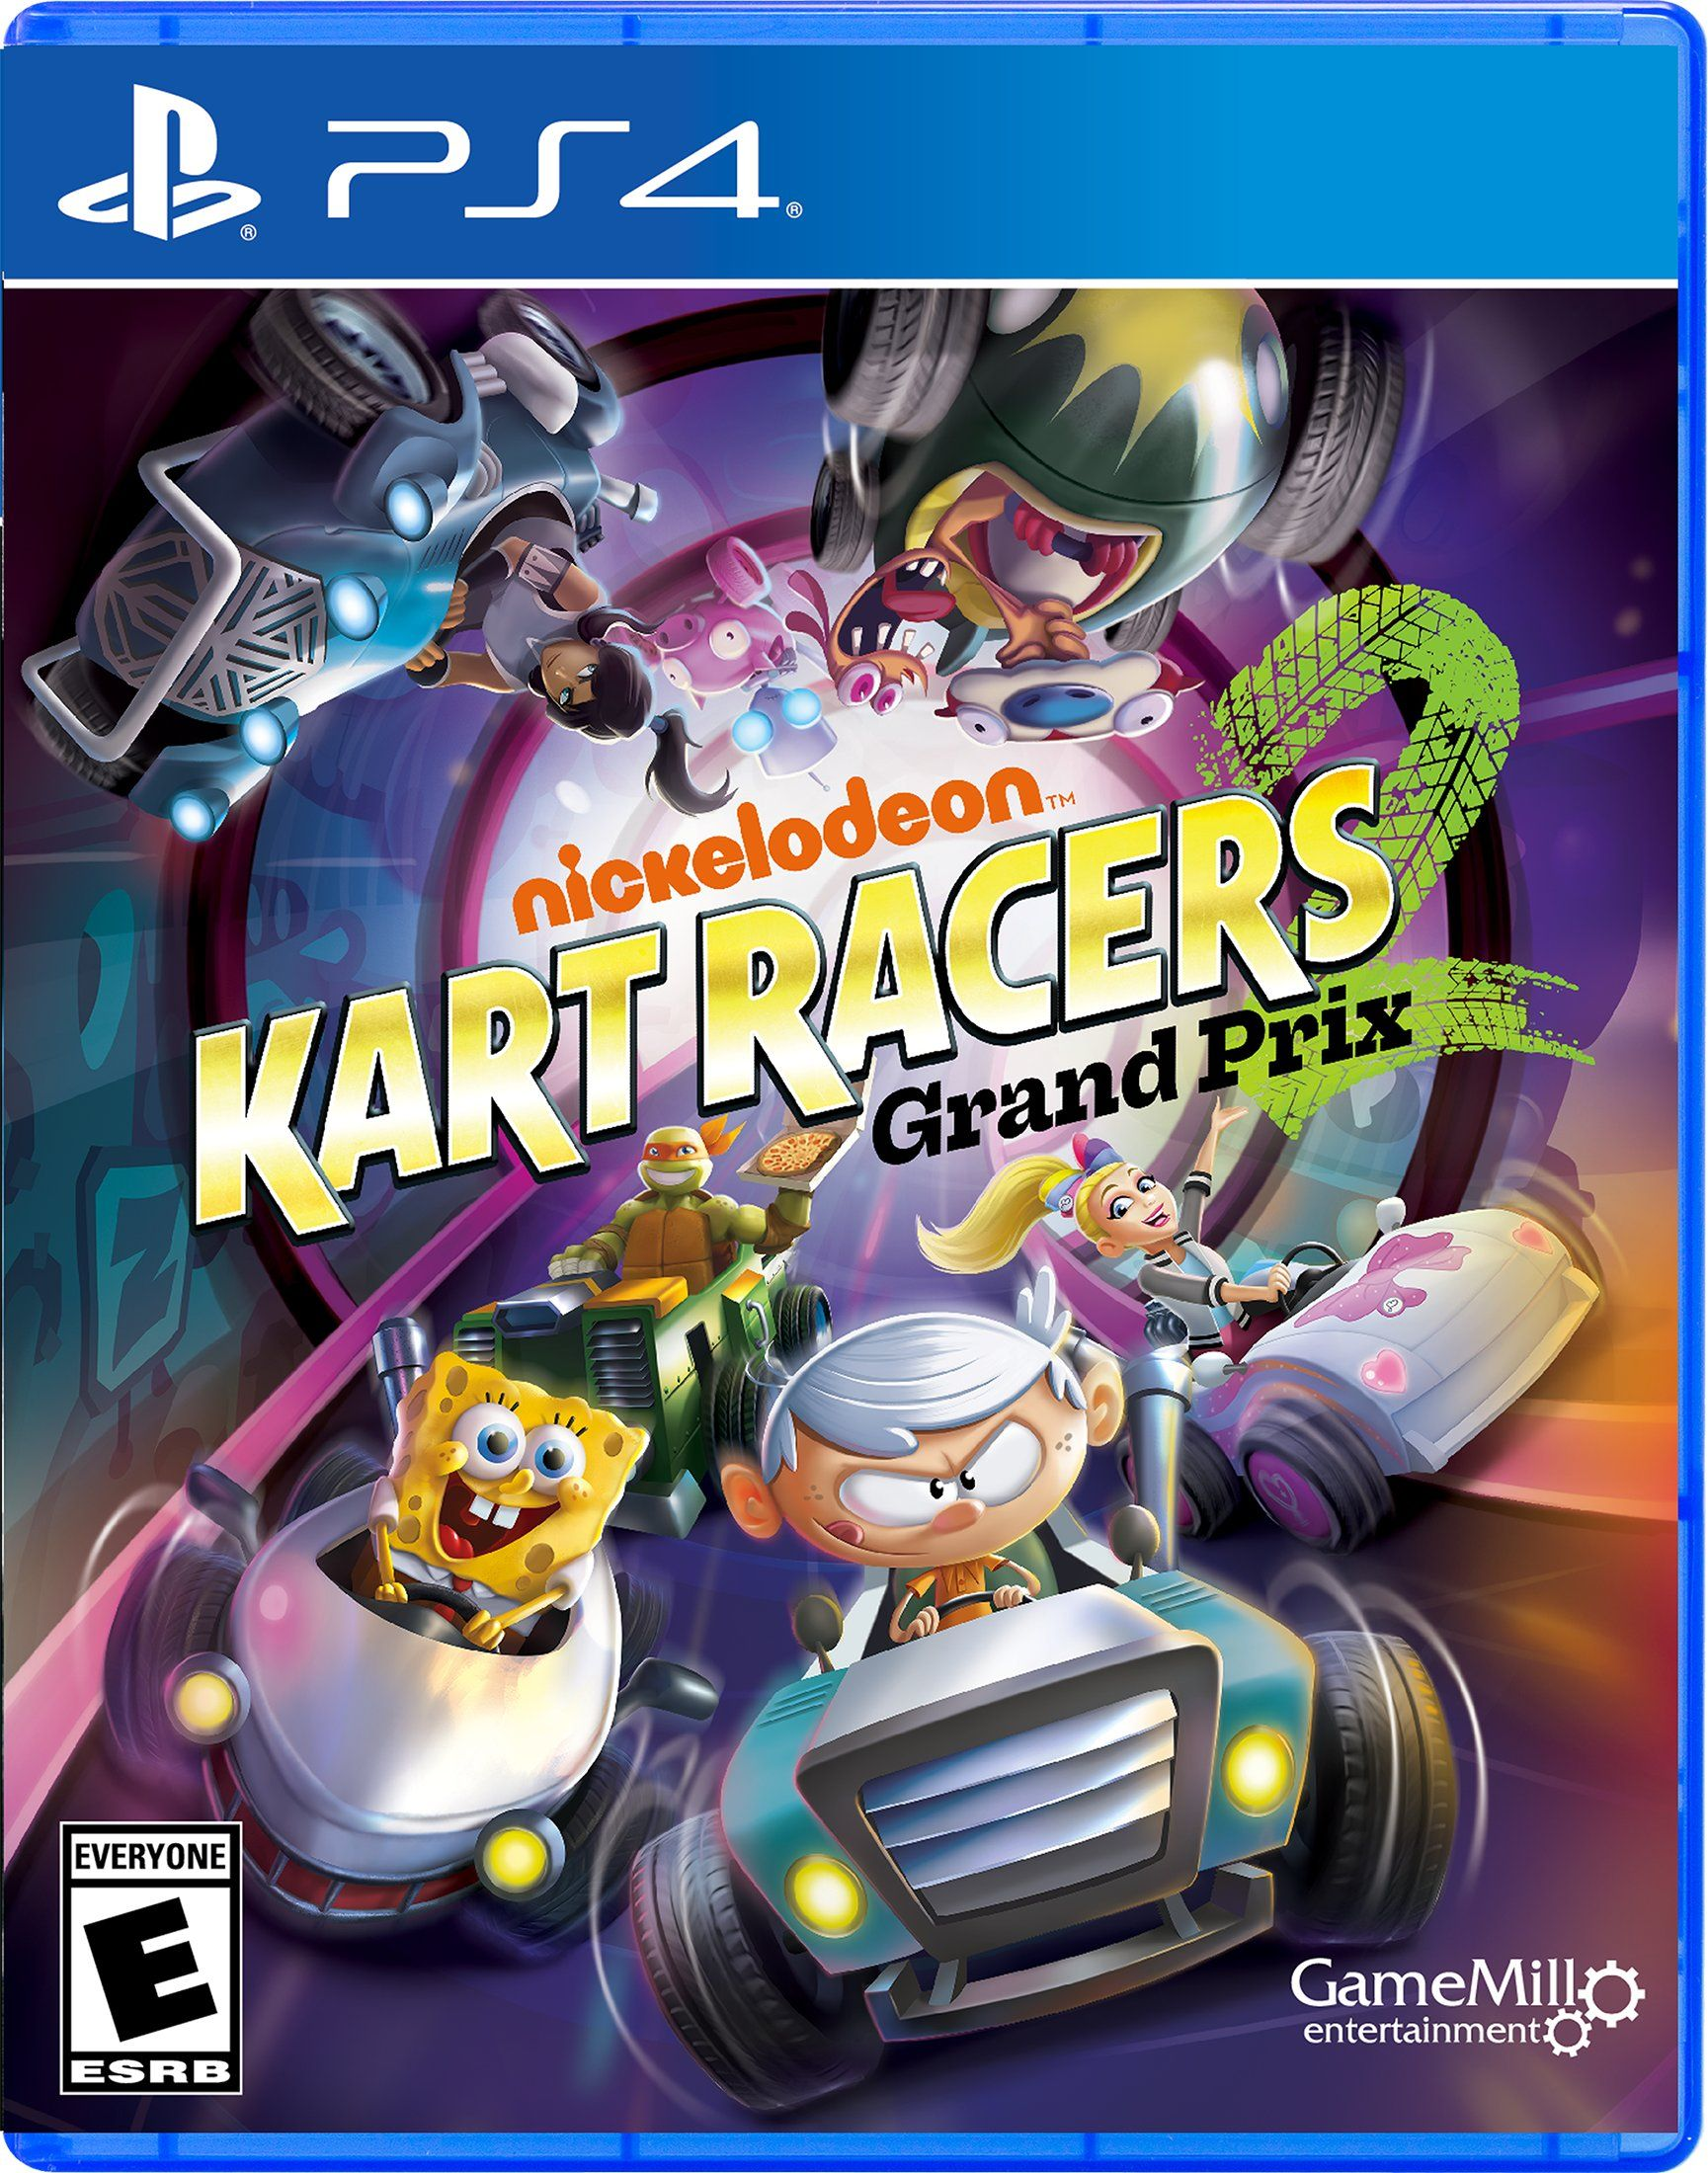 Nickelodeon Kart Racers 2 Grand Prix Ps4 In 2021 Nickelodeon Grand Prix Nintendo Switch